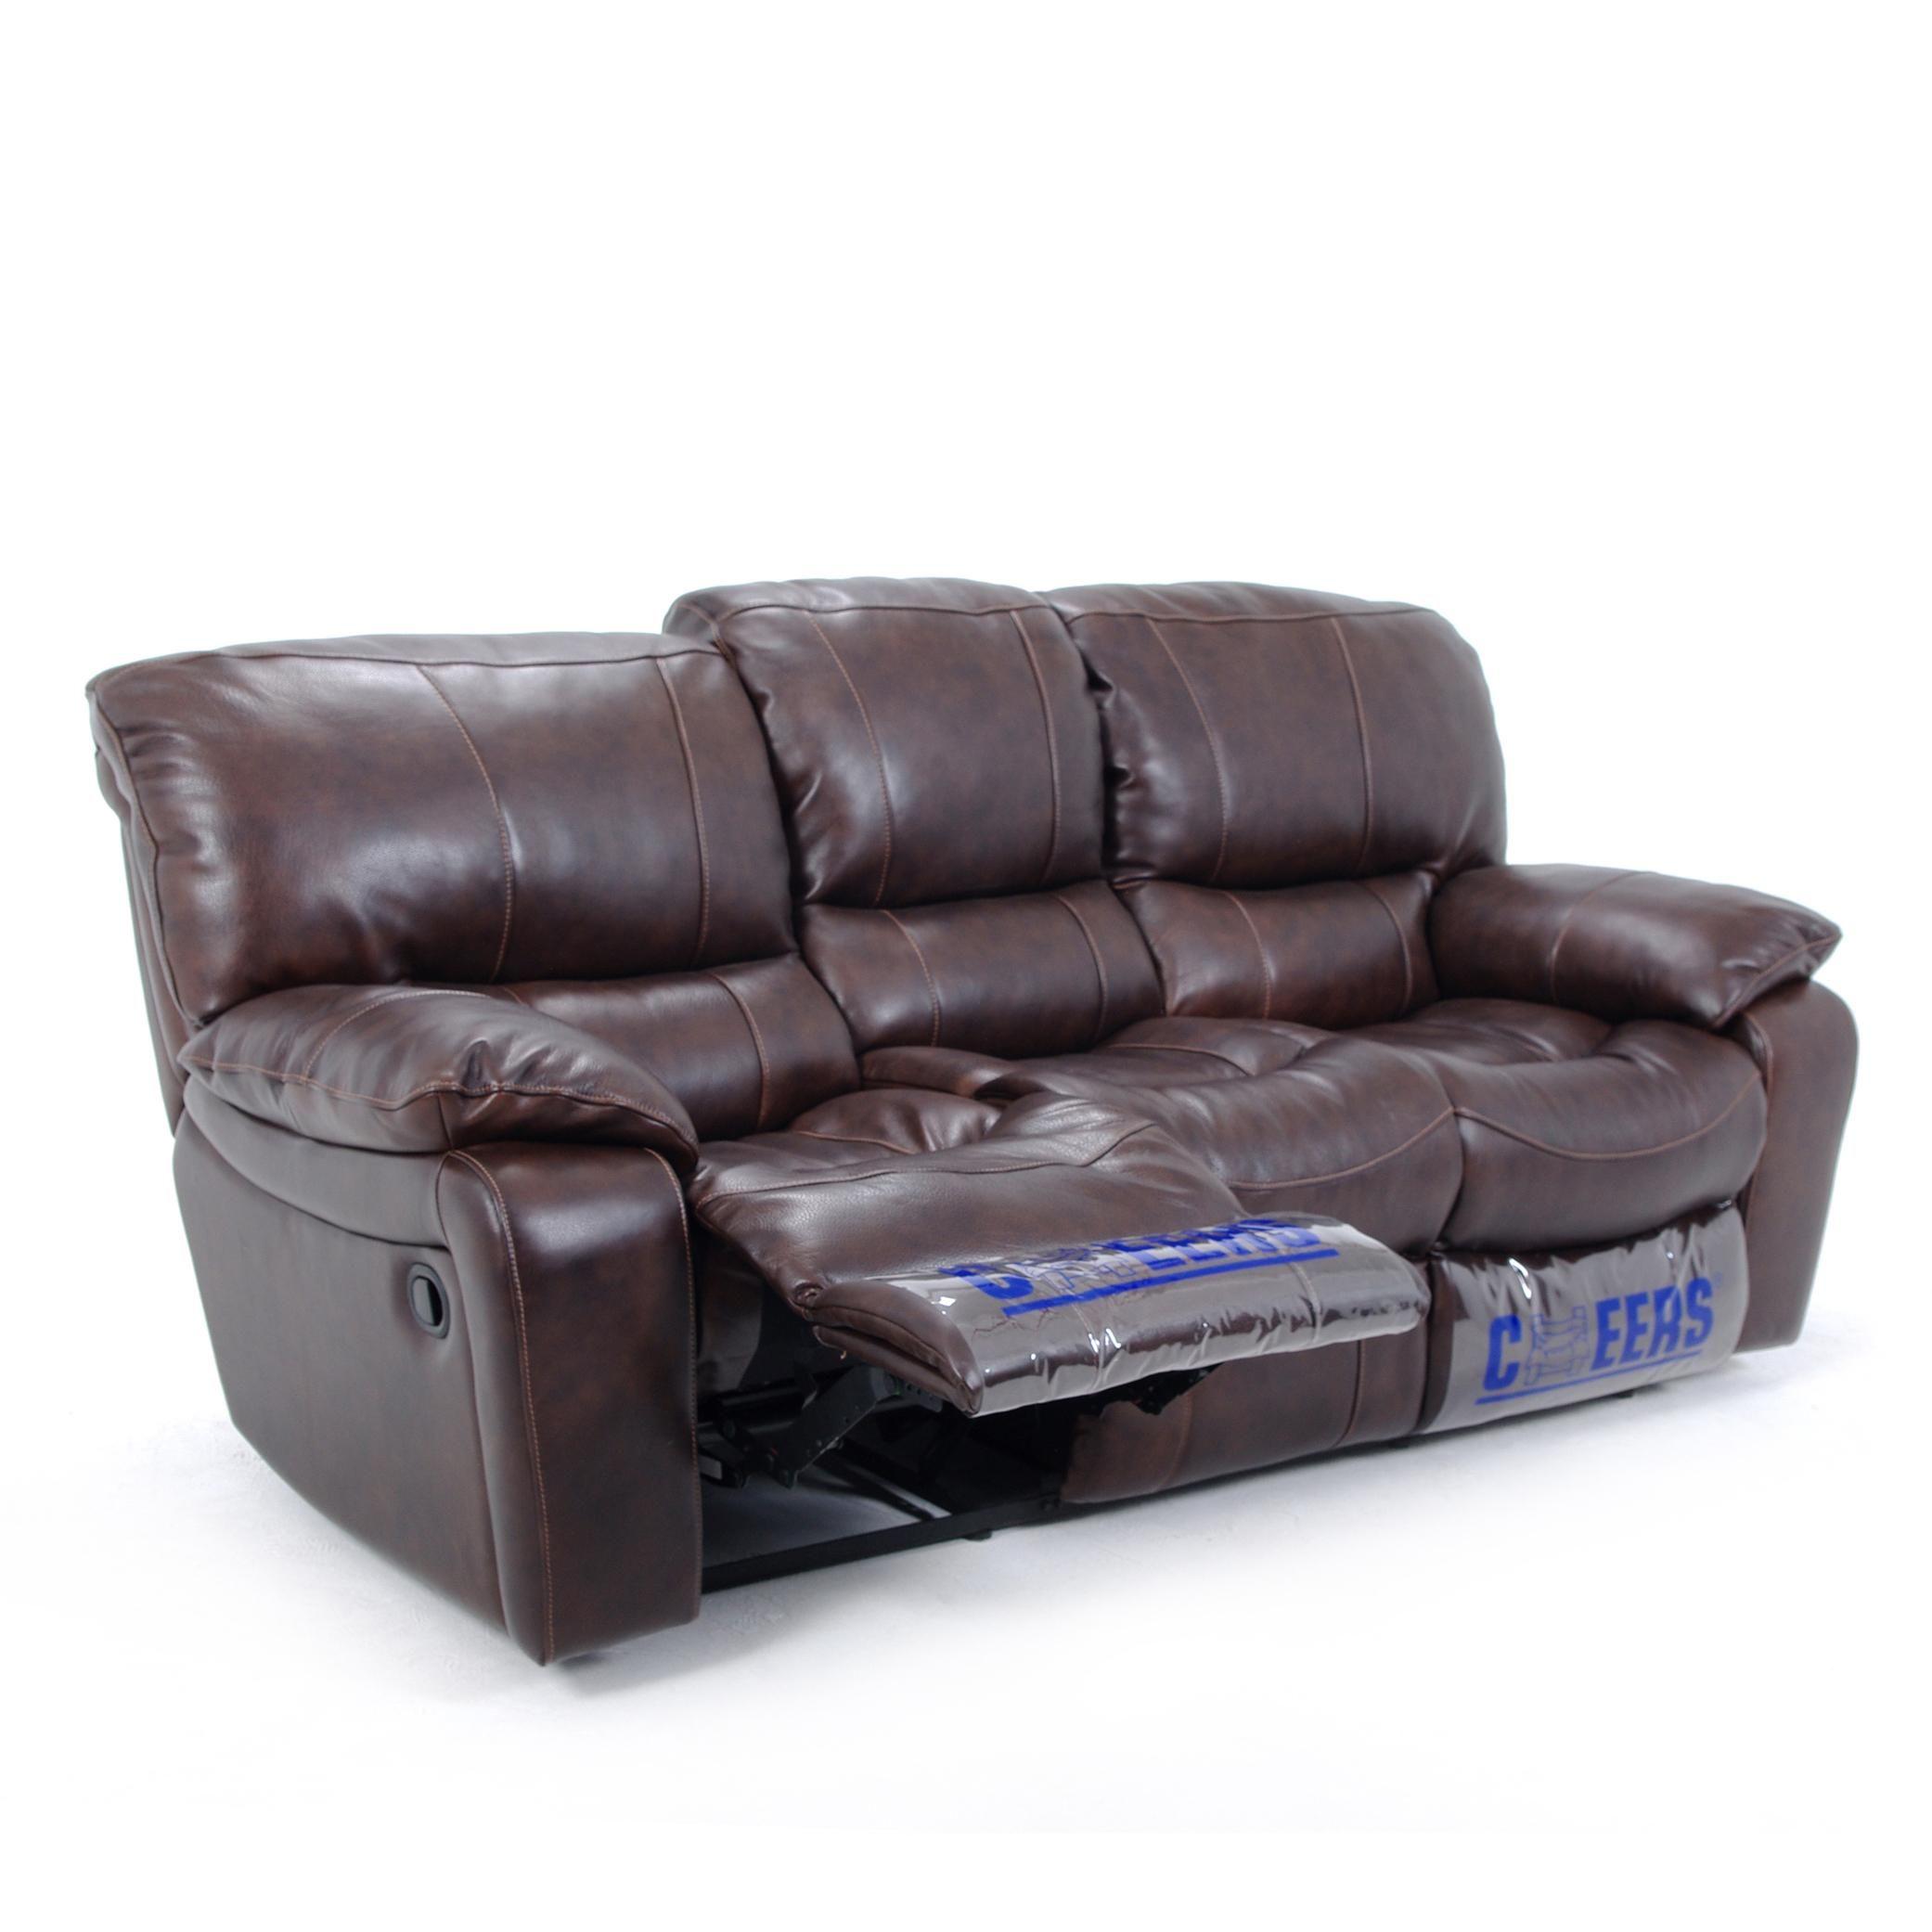 U8625 Reclining Leather Sofa By Cheers Sofa Sofa Top Grain